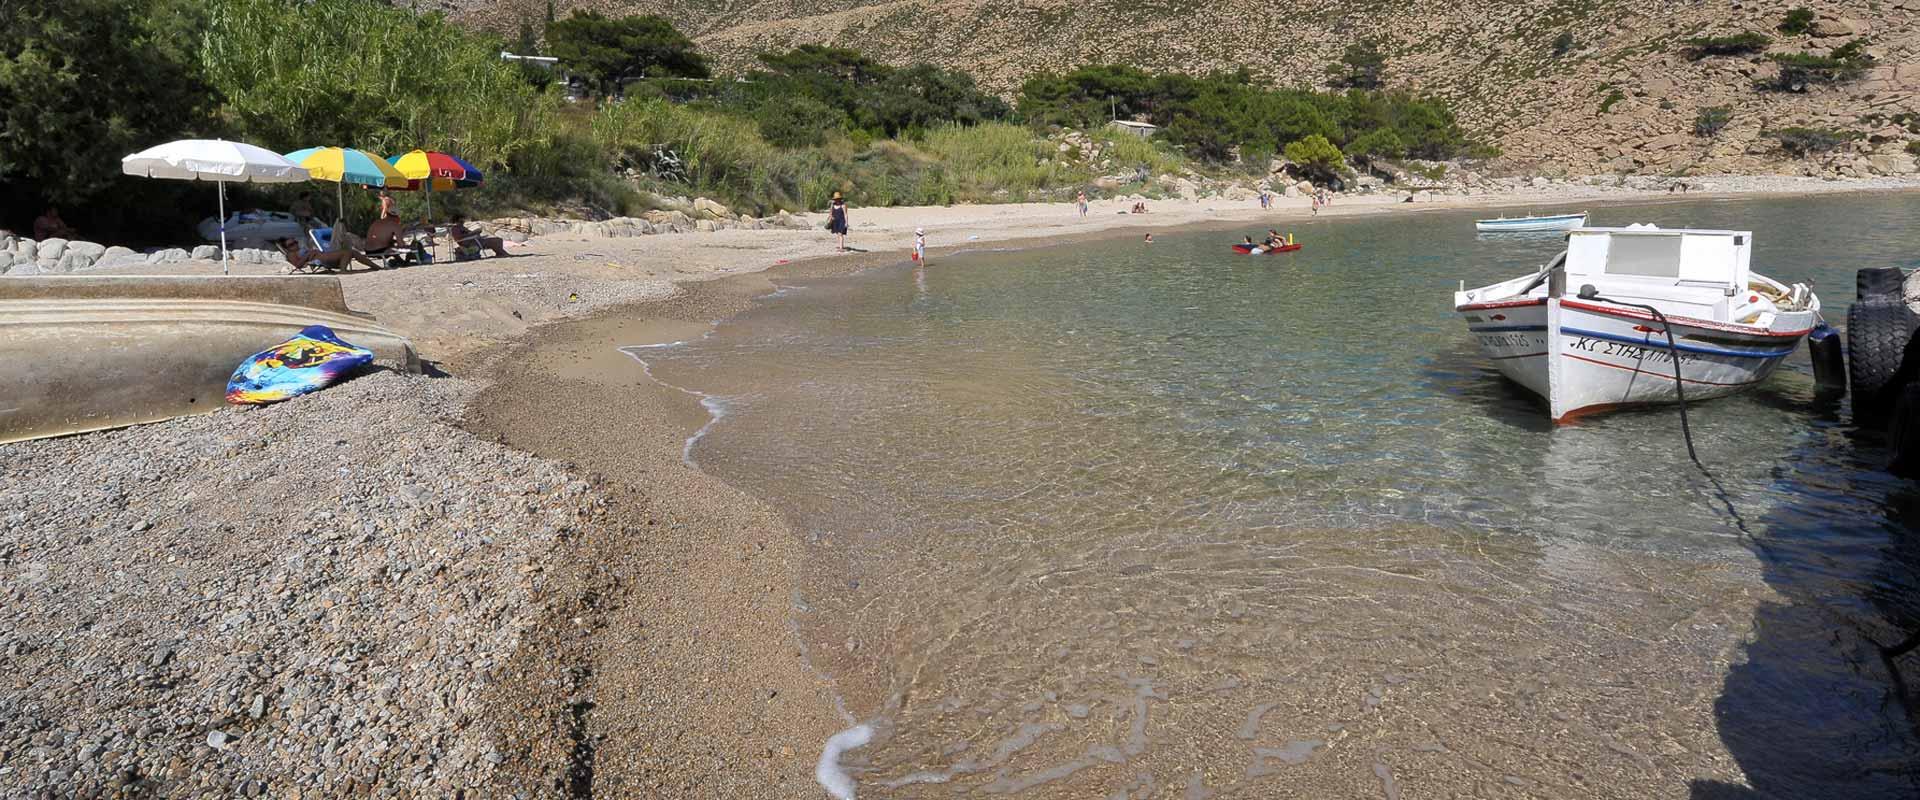 ikaria olivia villas trapalou beach image